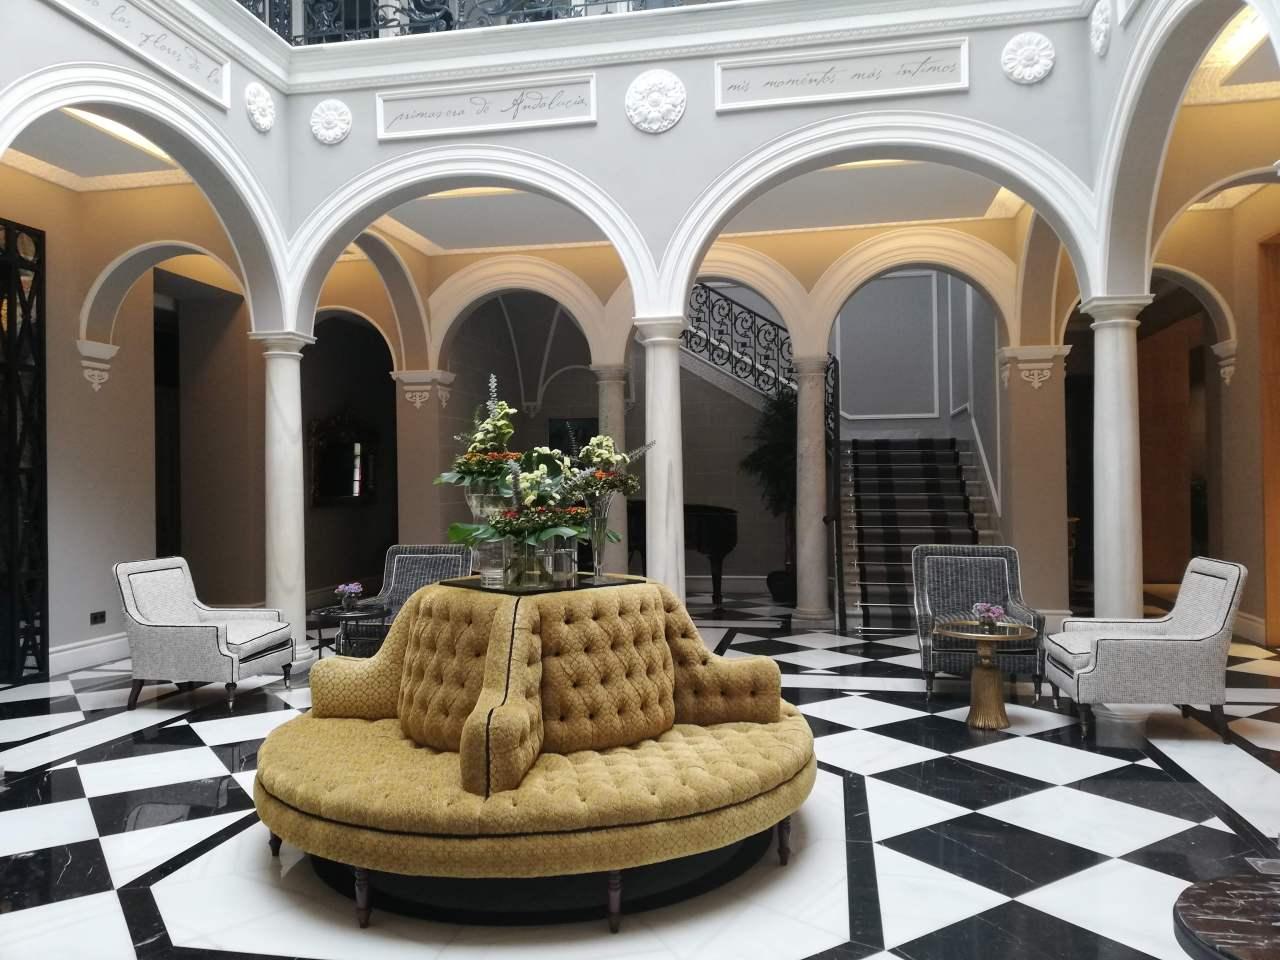 Discover Sherry recommends: Hotel Casa Palacio MaríaLuisa.